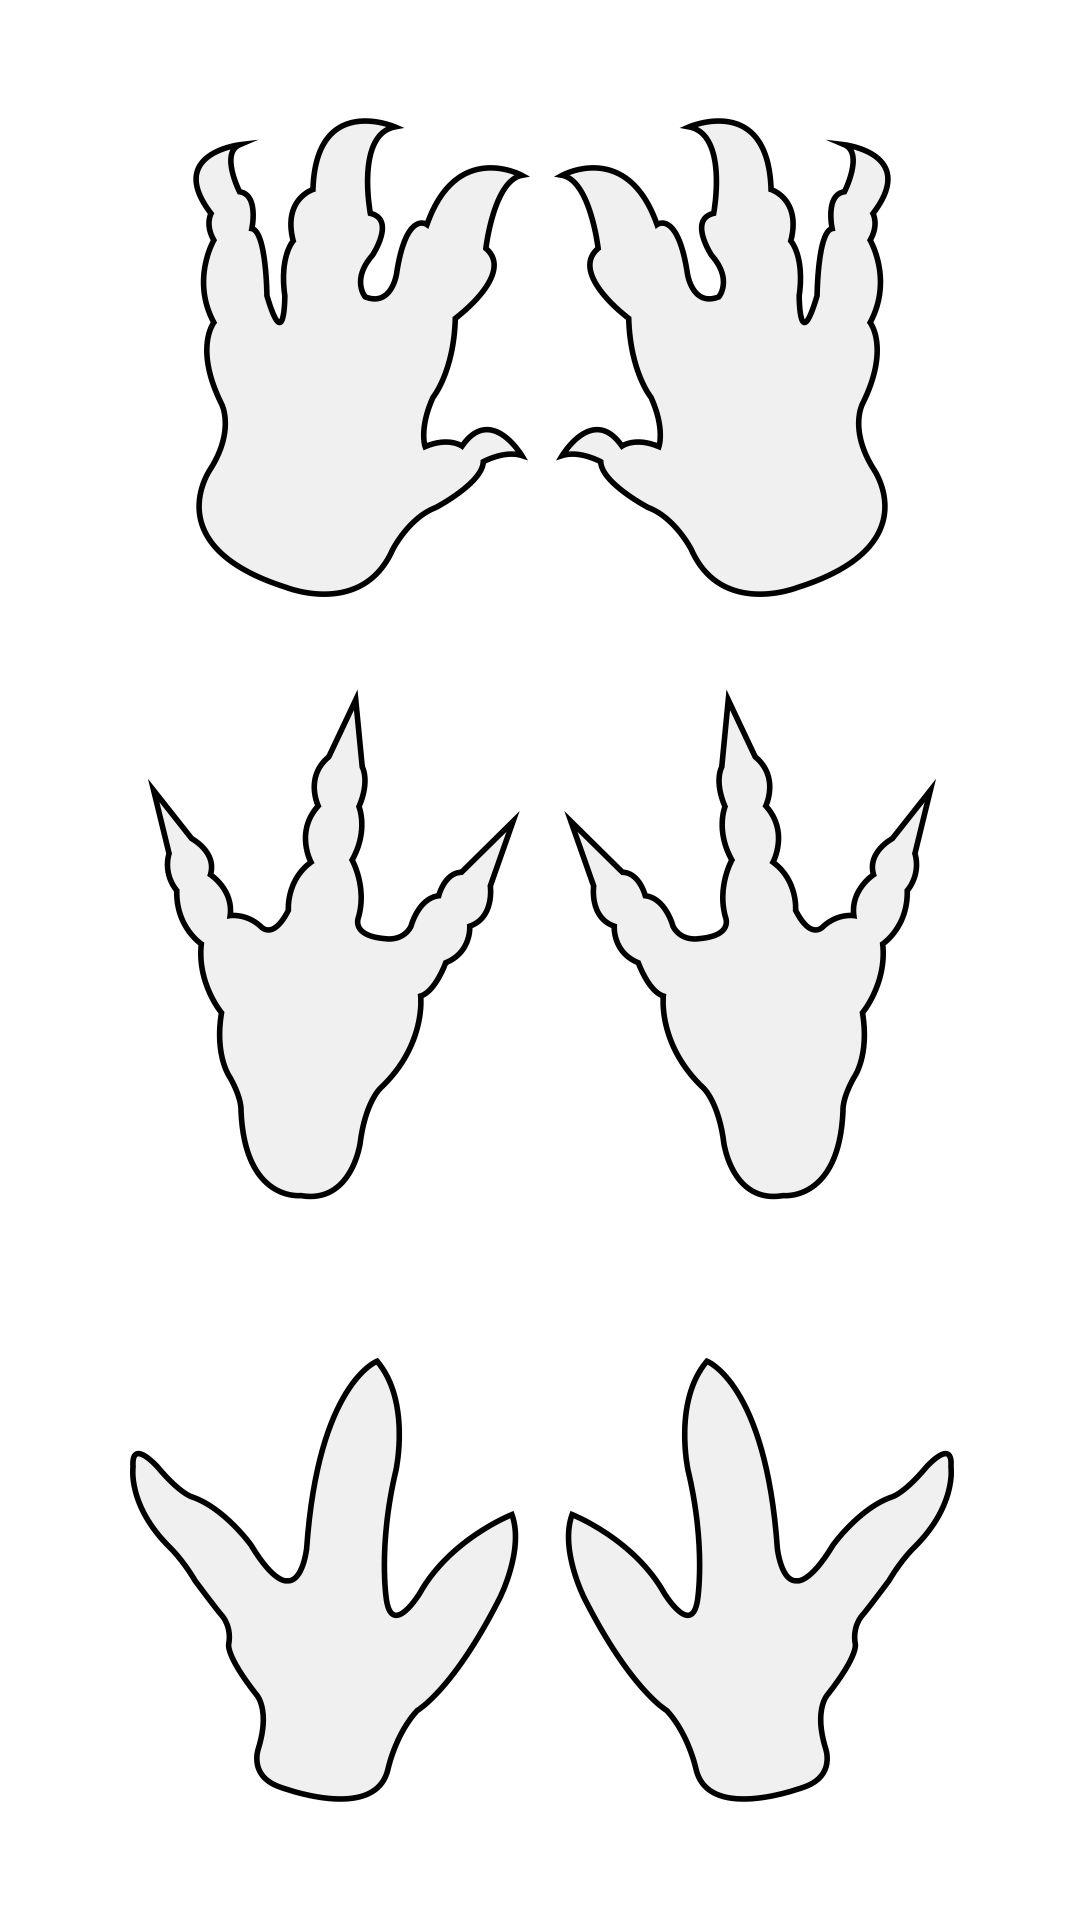 Dinosaur Footprint Print Out